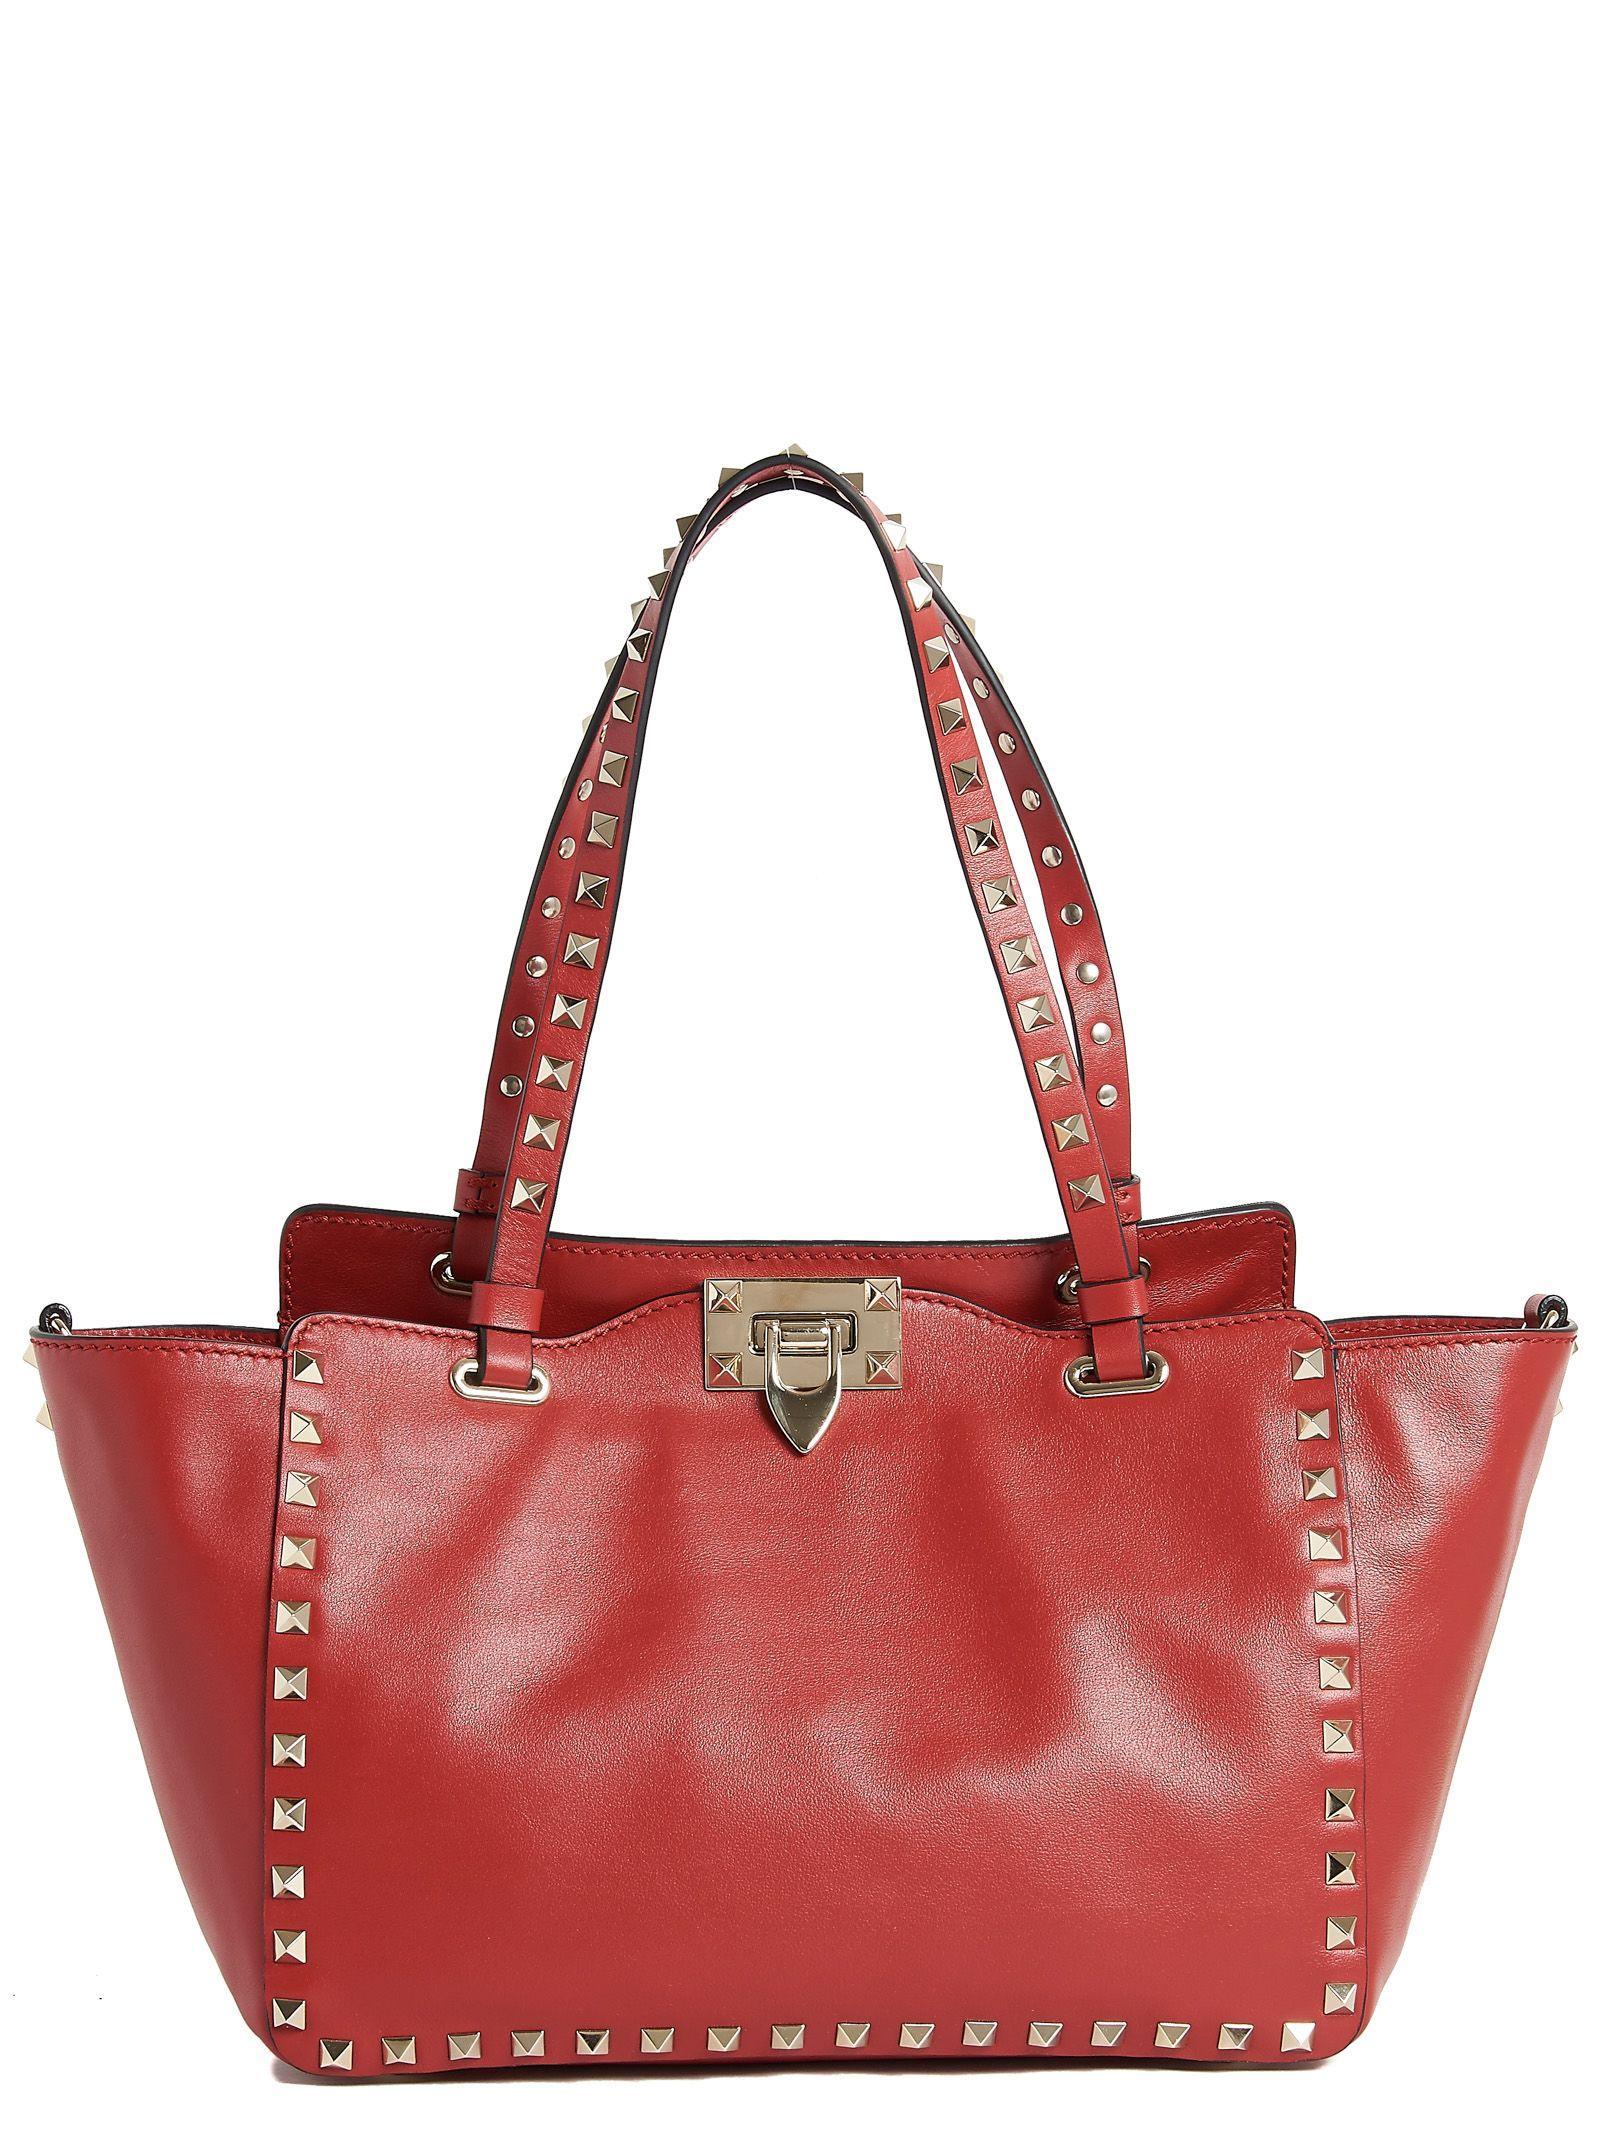 Valentino Bag In Red